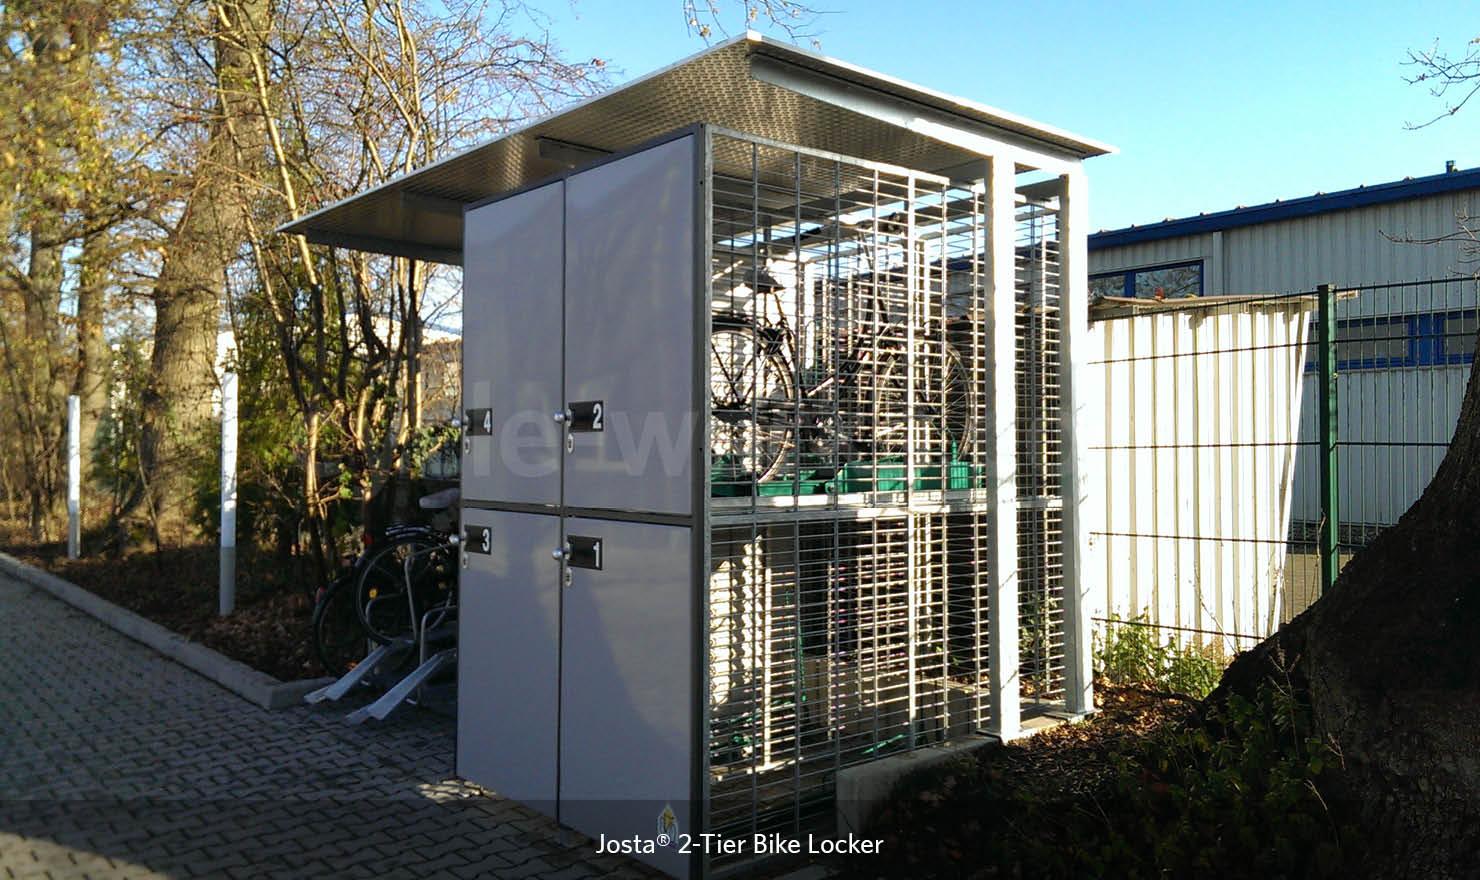 Josta Bike Store Lockers